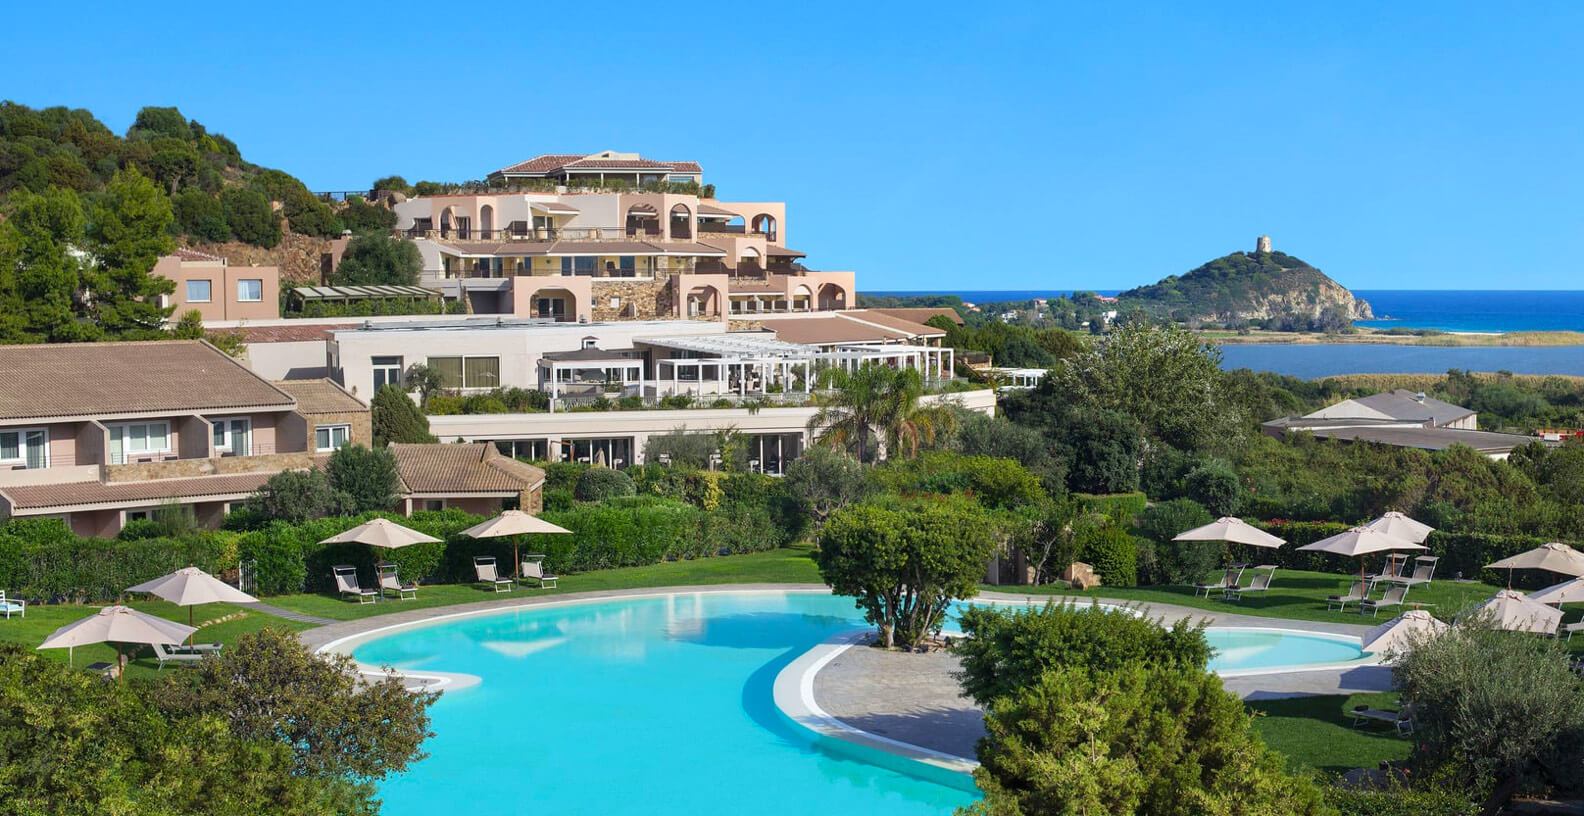 Cartina Sardegna Con Hotel.Hotel Laguna A Chia Hotel 5 Stelle In Sardegna Domus De Maria